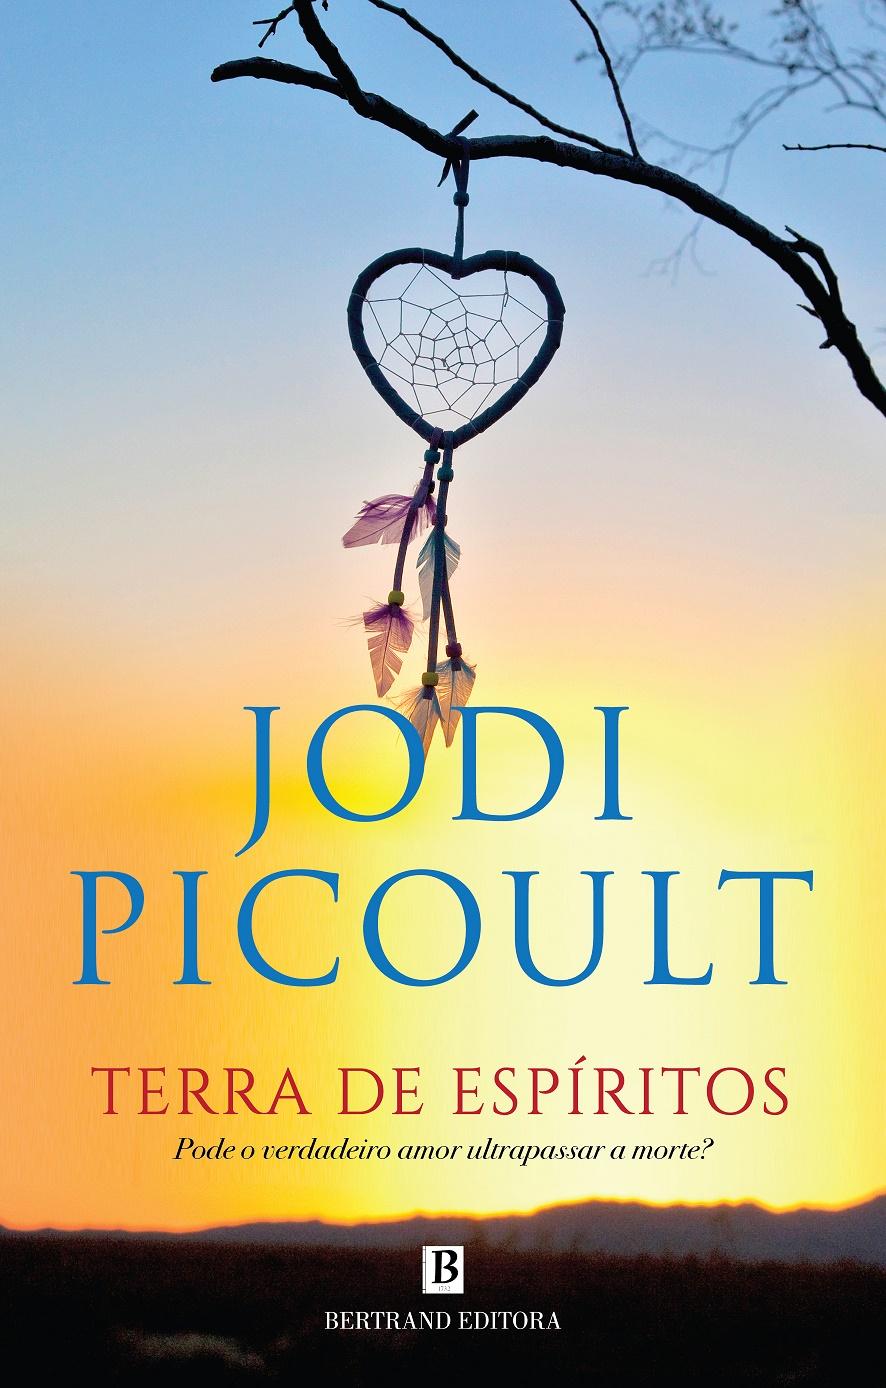 Capa_Terra de Espíritos_Jodi Picoult